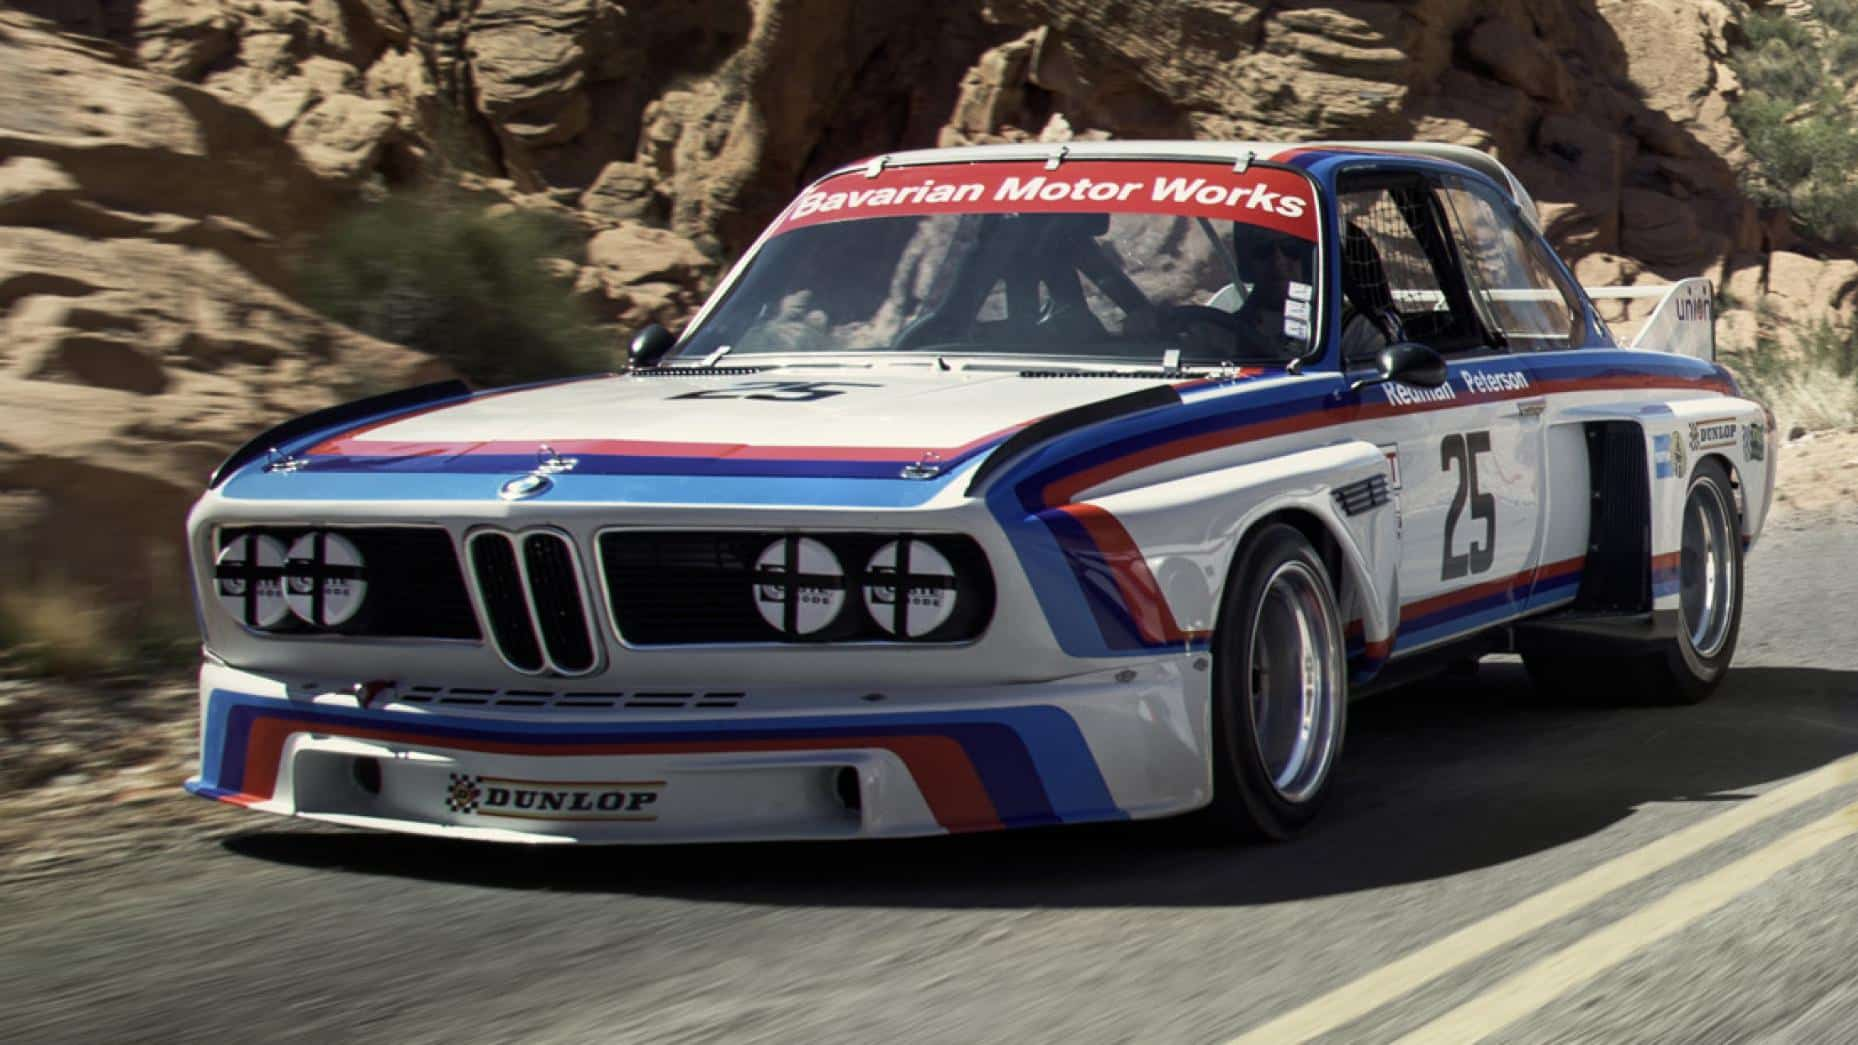 BMW CSL AKA BMW E CARLASSIC - 3 0 bmw